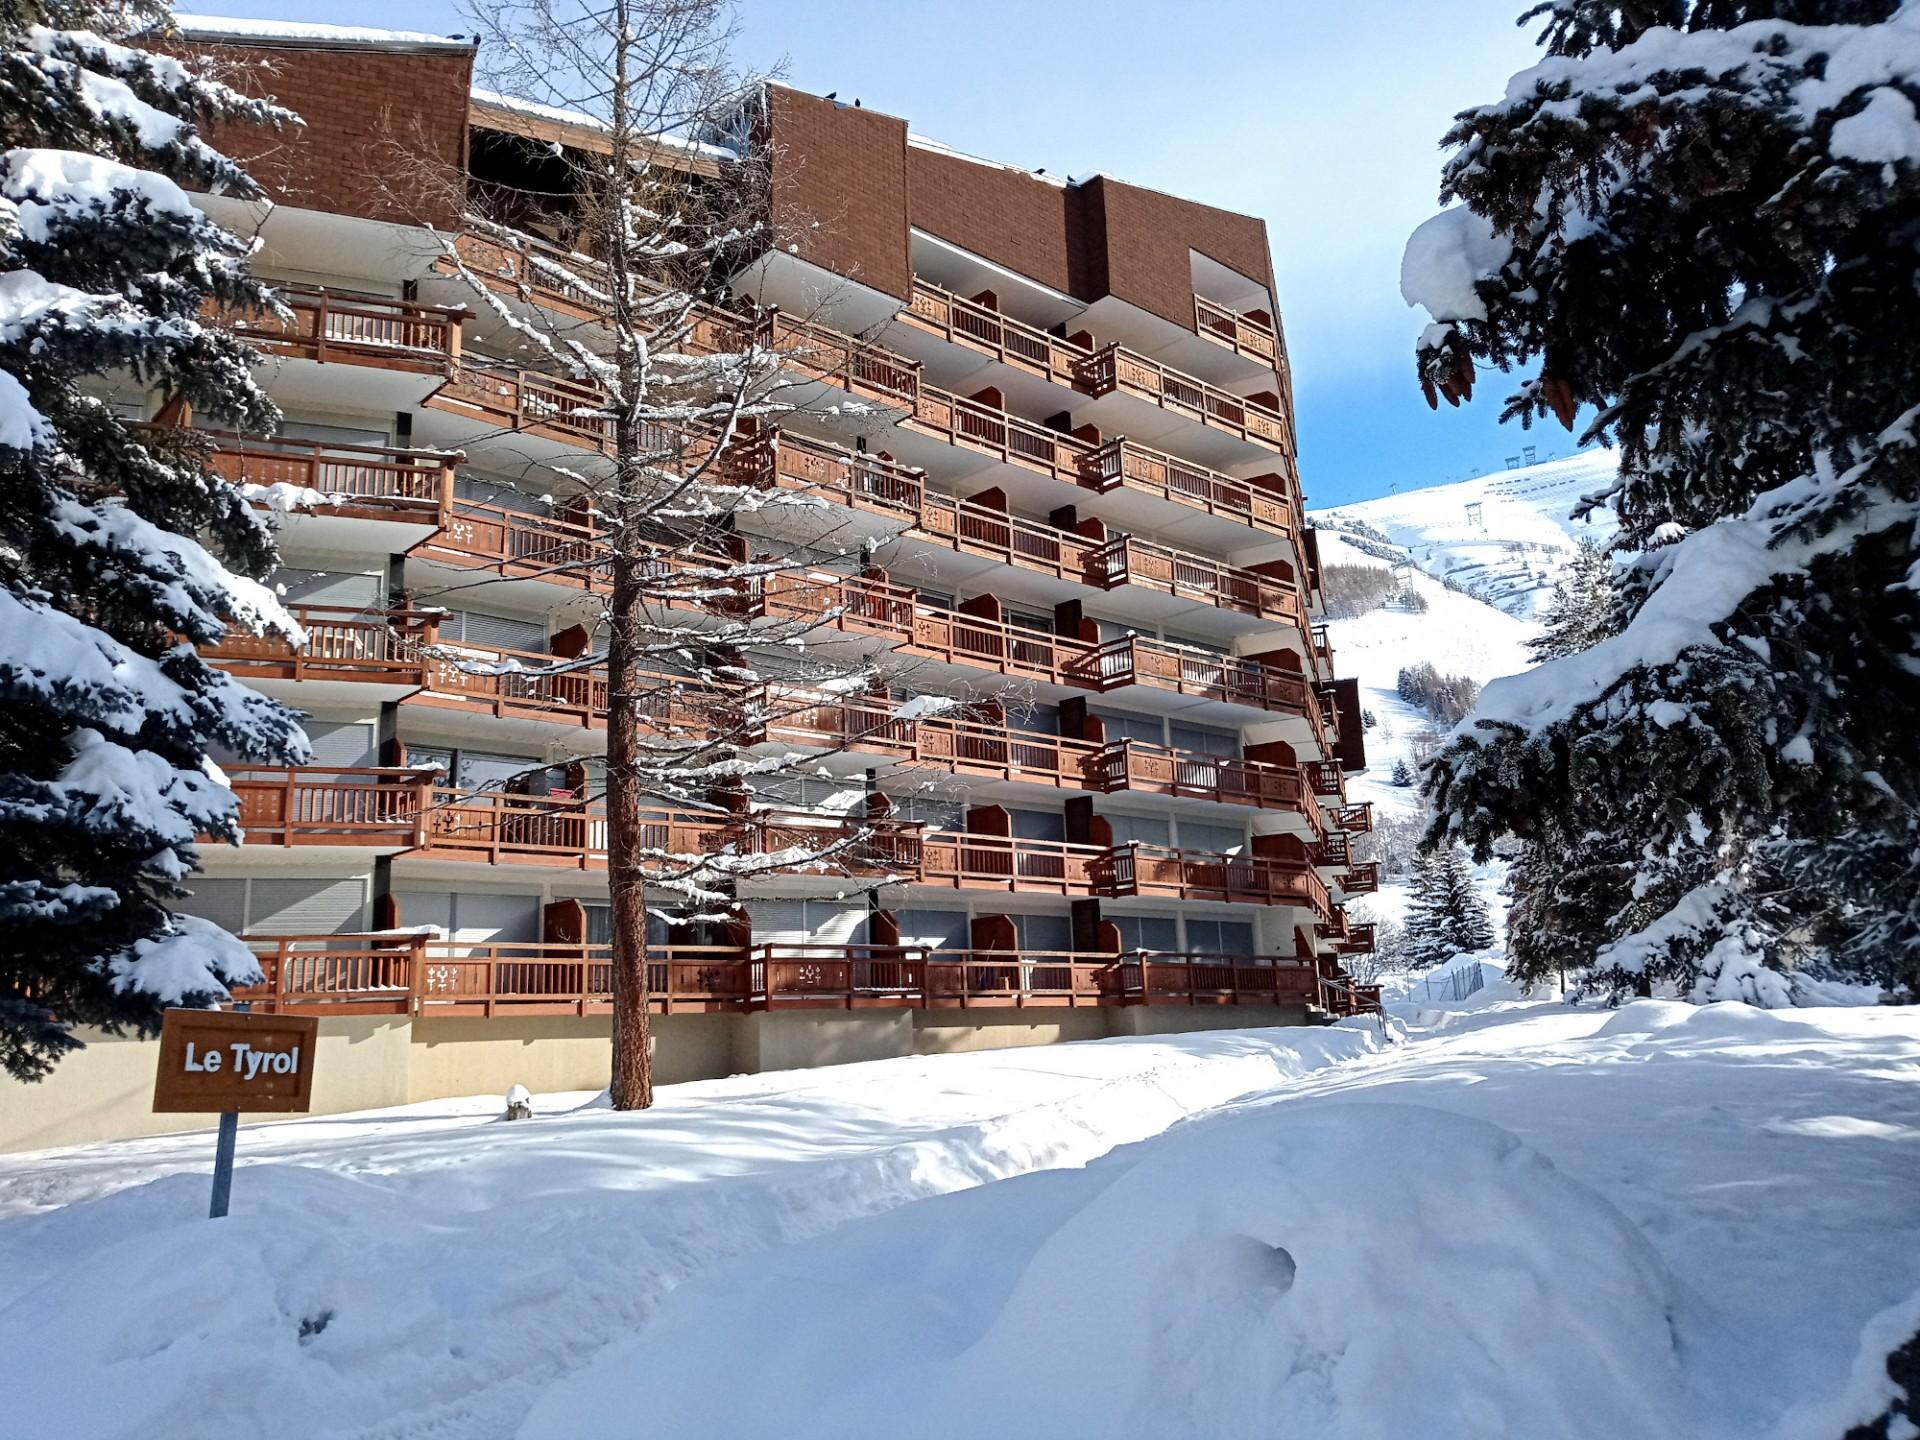 Residence Le Tyrol